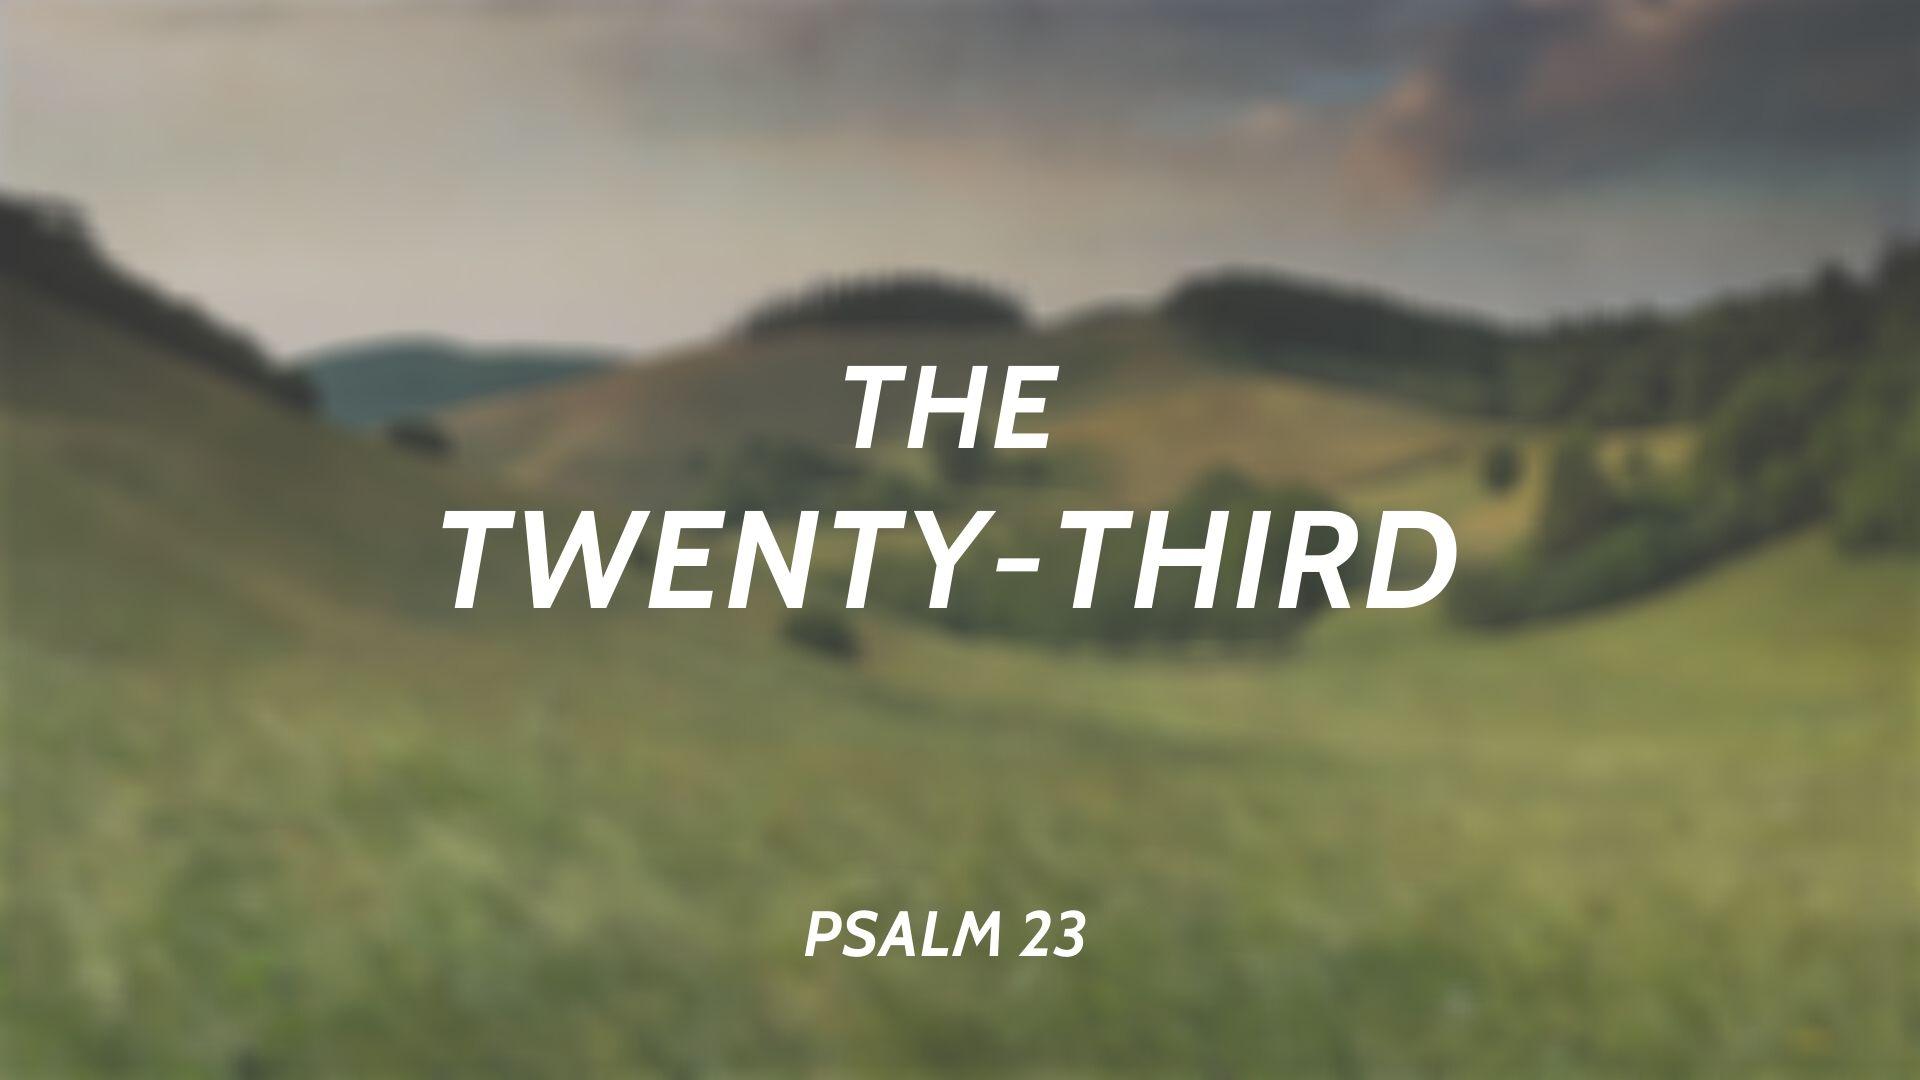 The Twenty-Third